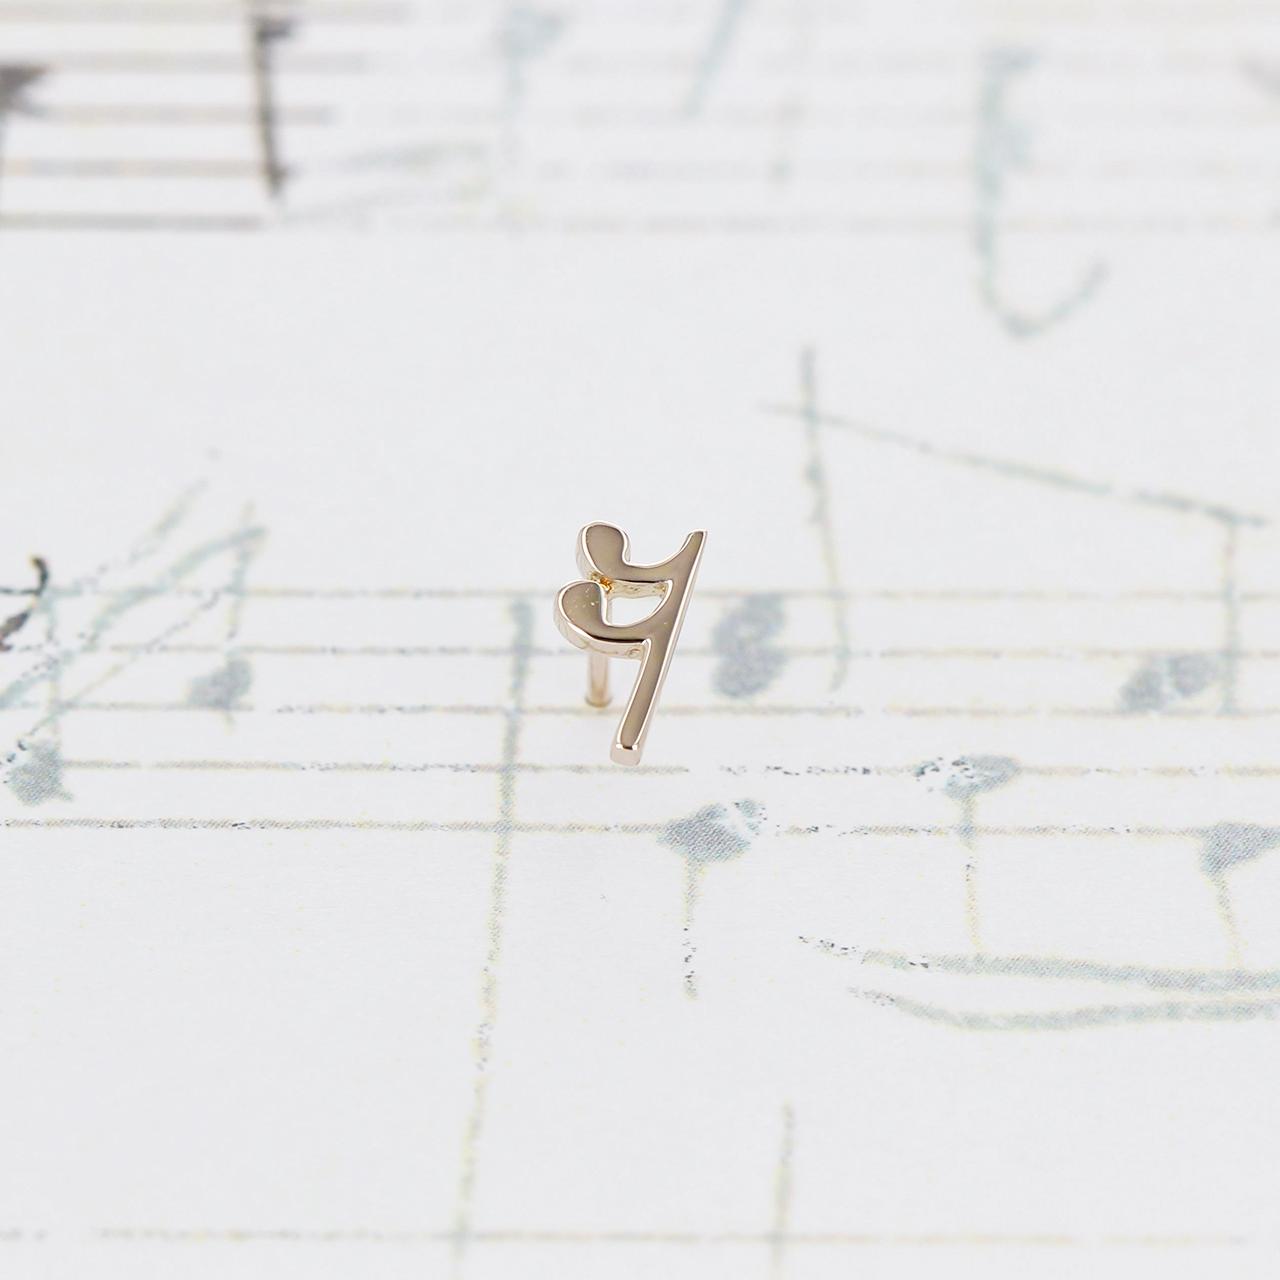 K10 / ピアス (片耳) / 16分休符スタッドピアス